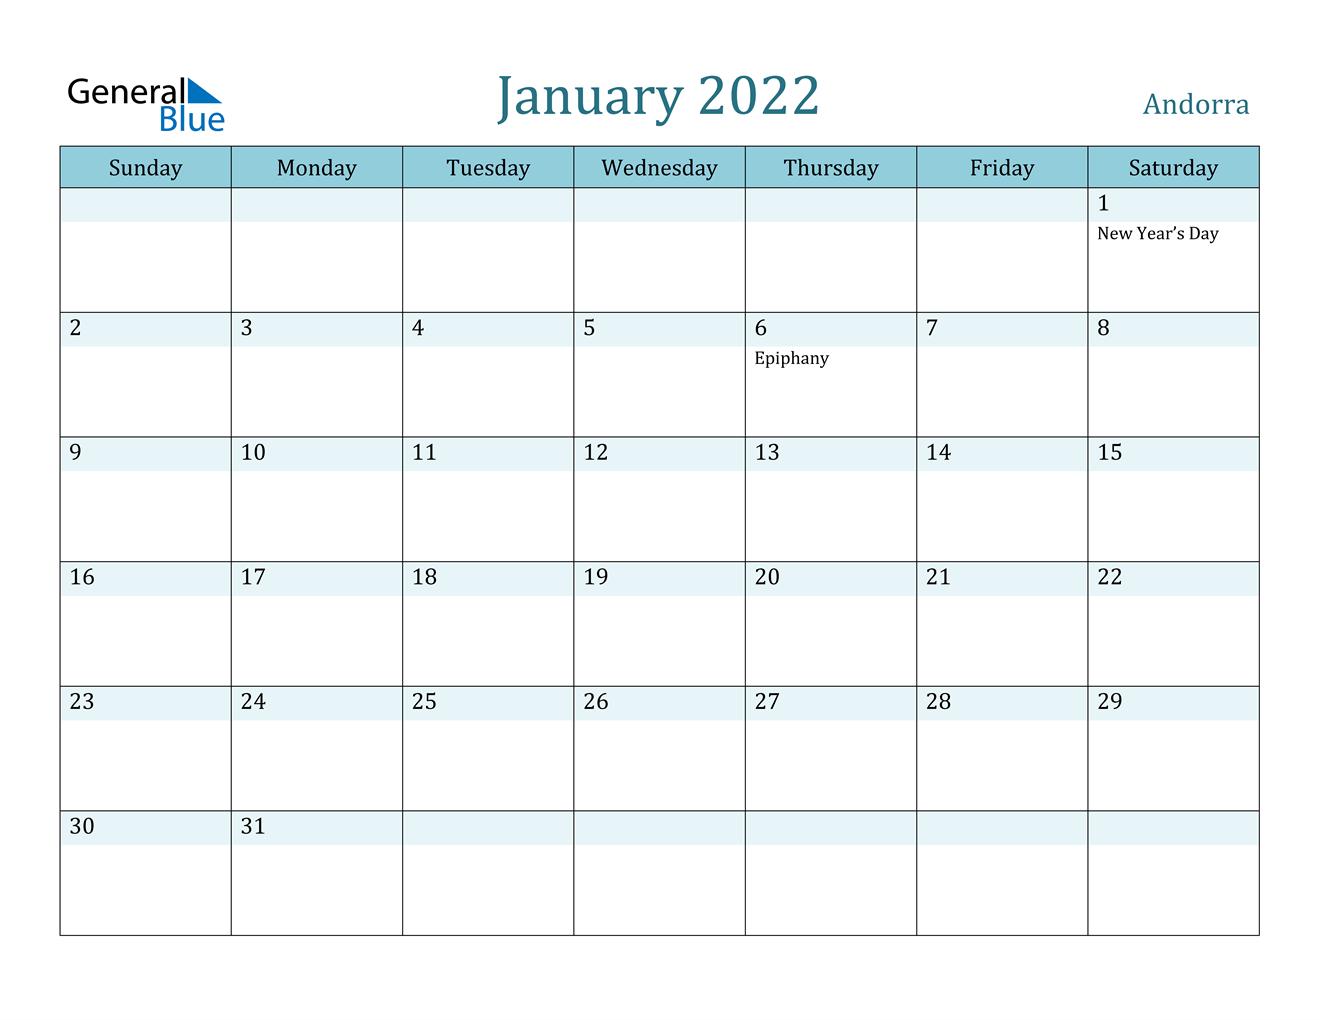 Andorra January 2022 Calendar With Holidays with regard to Free Printable January Calendar 2022 Photo